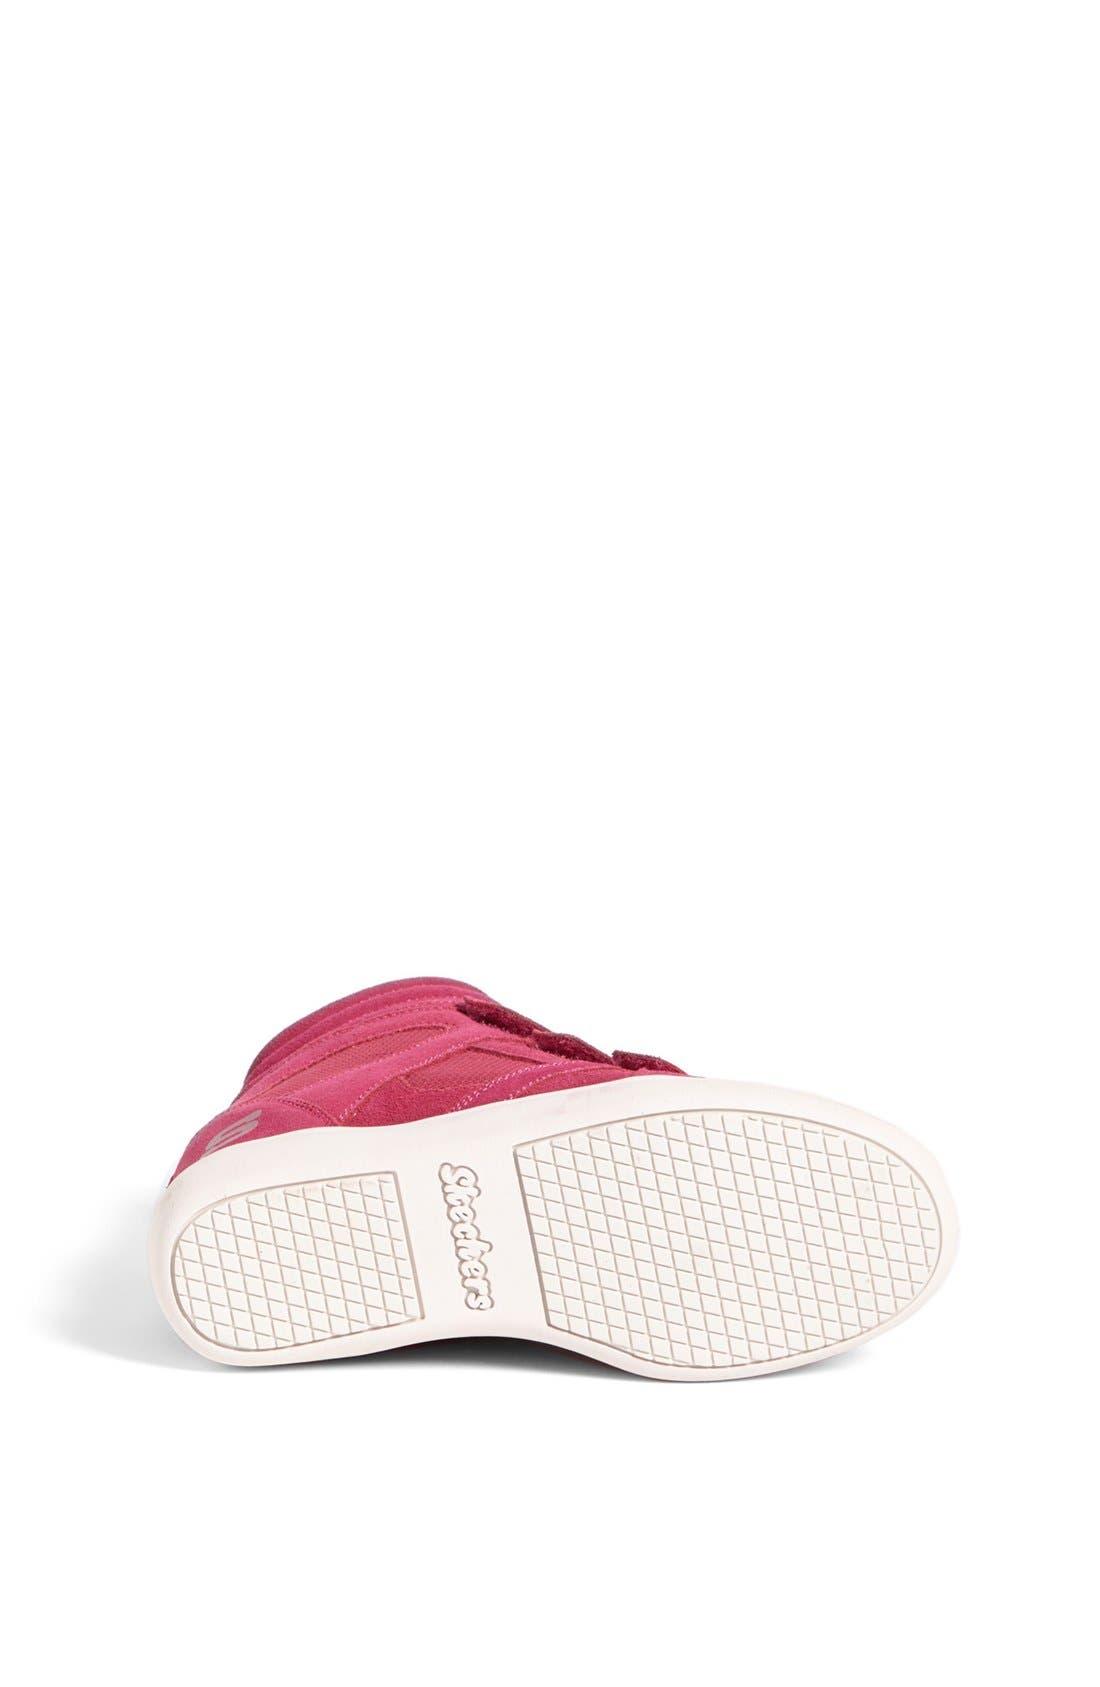 Alternate Image 4  - SKECHERS 'Double Trouble' Wedge Sneaker (Toddler, Little Kid & Big Kid)